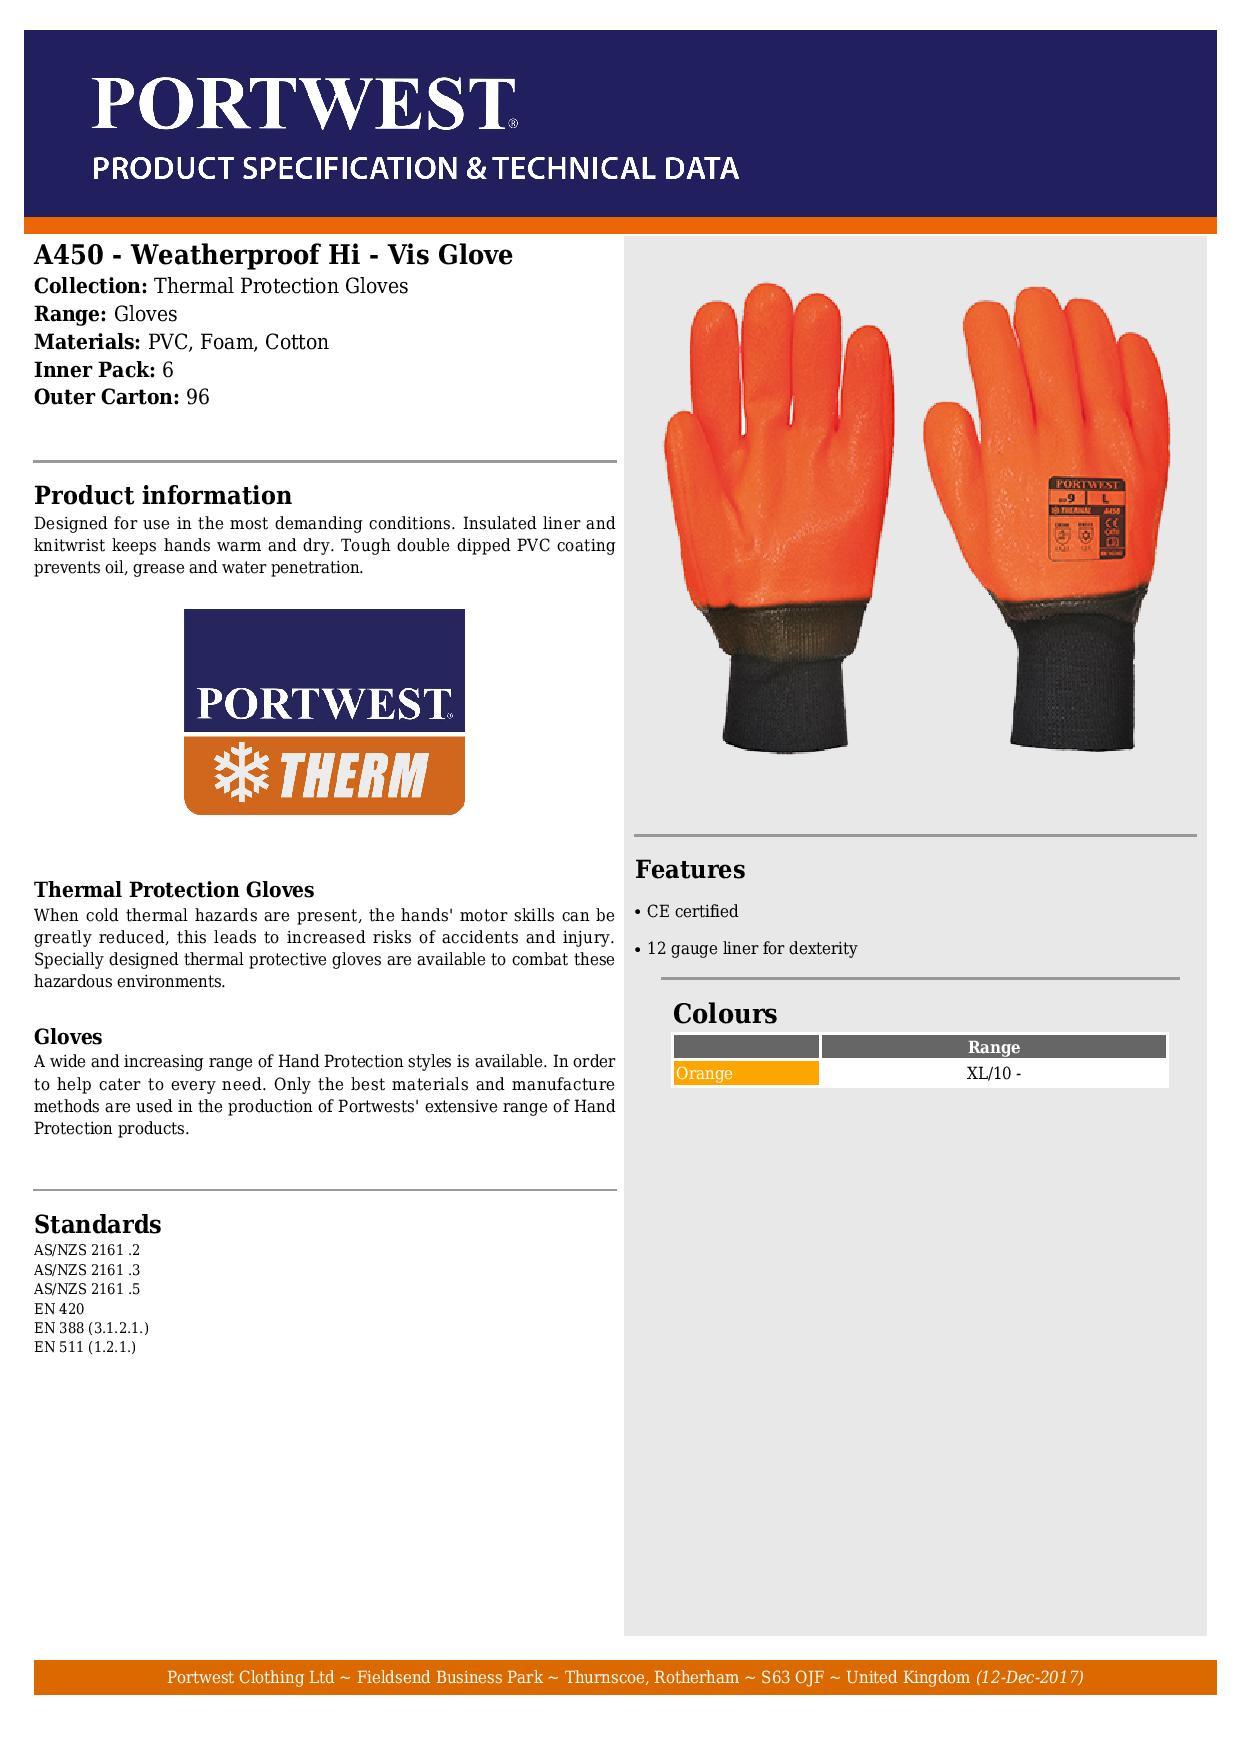 PORTWEST A450 weatherproof hi-vis orange PVC glove size XL